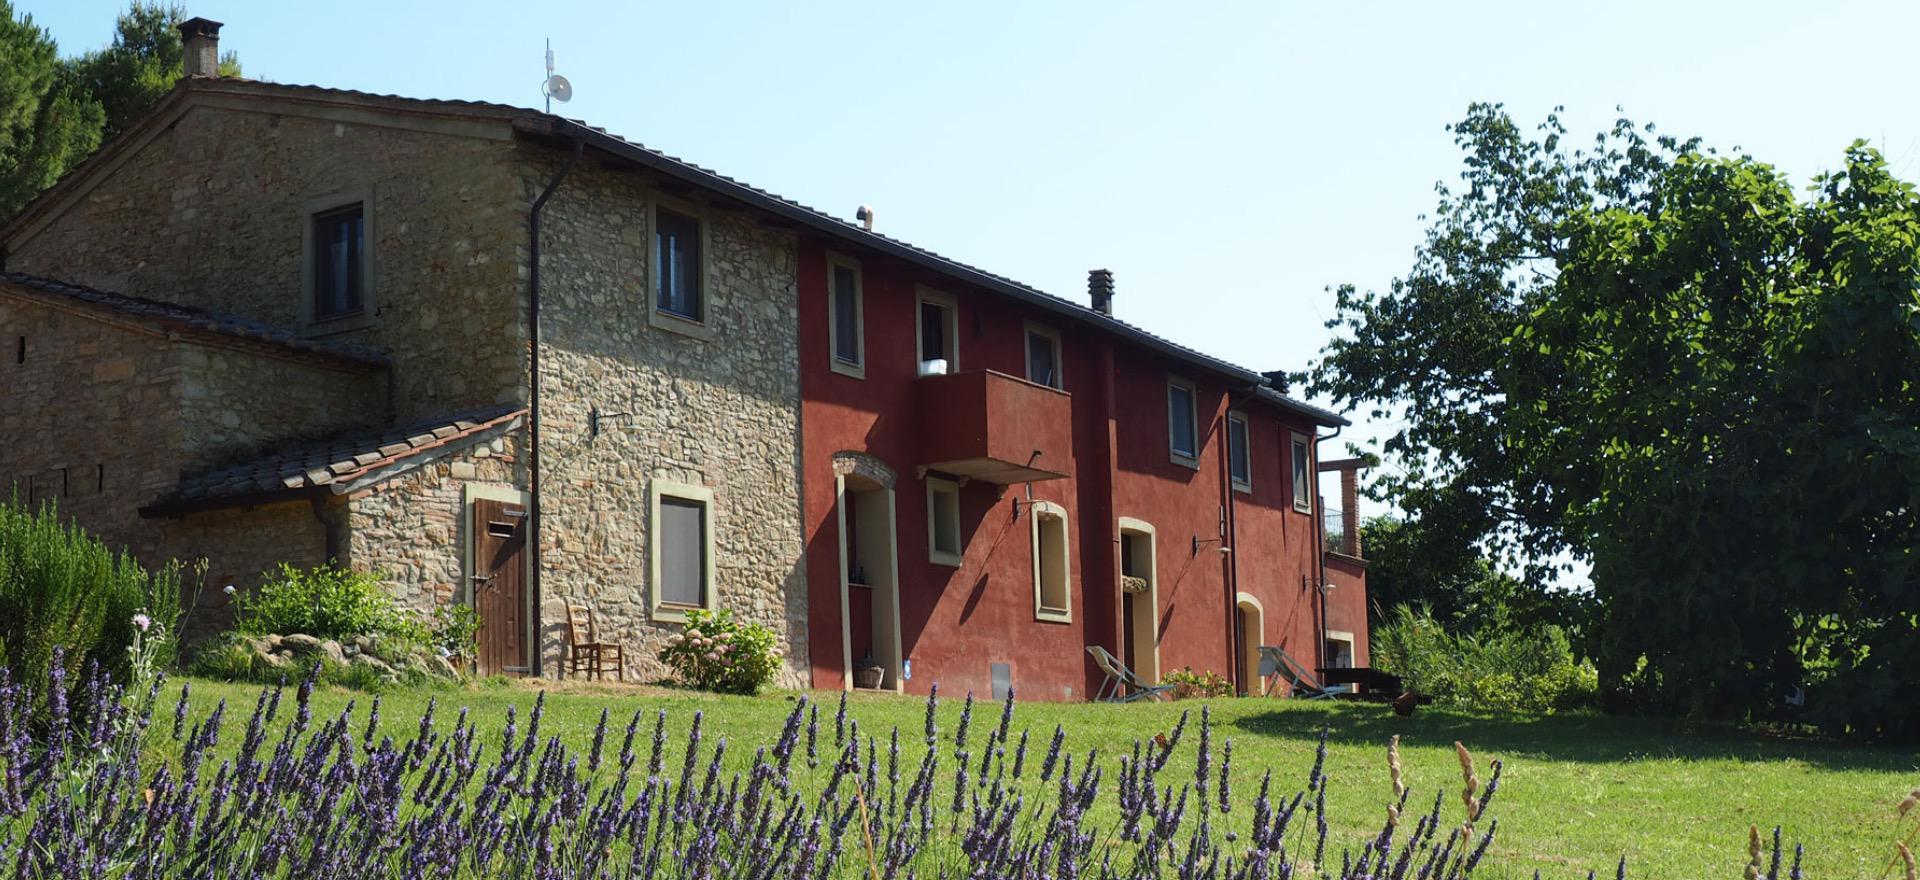 Gastvrije agriturismo met restaurant in Toscane